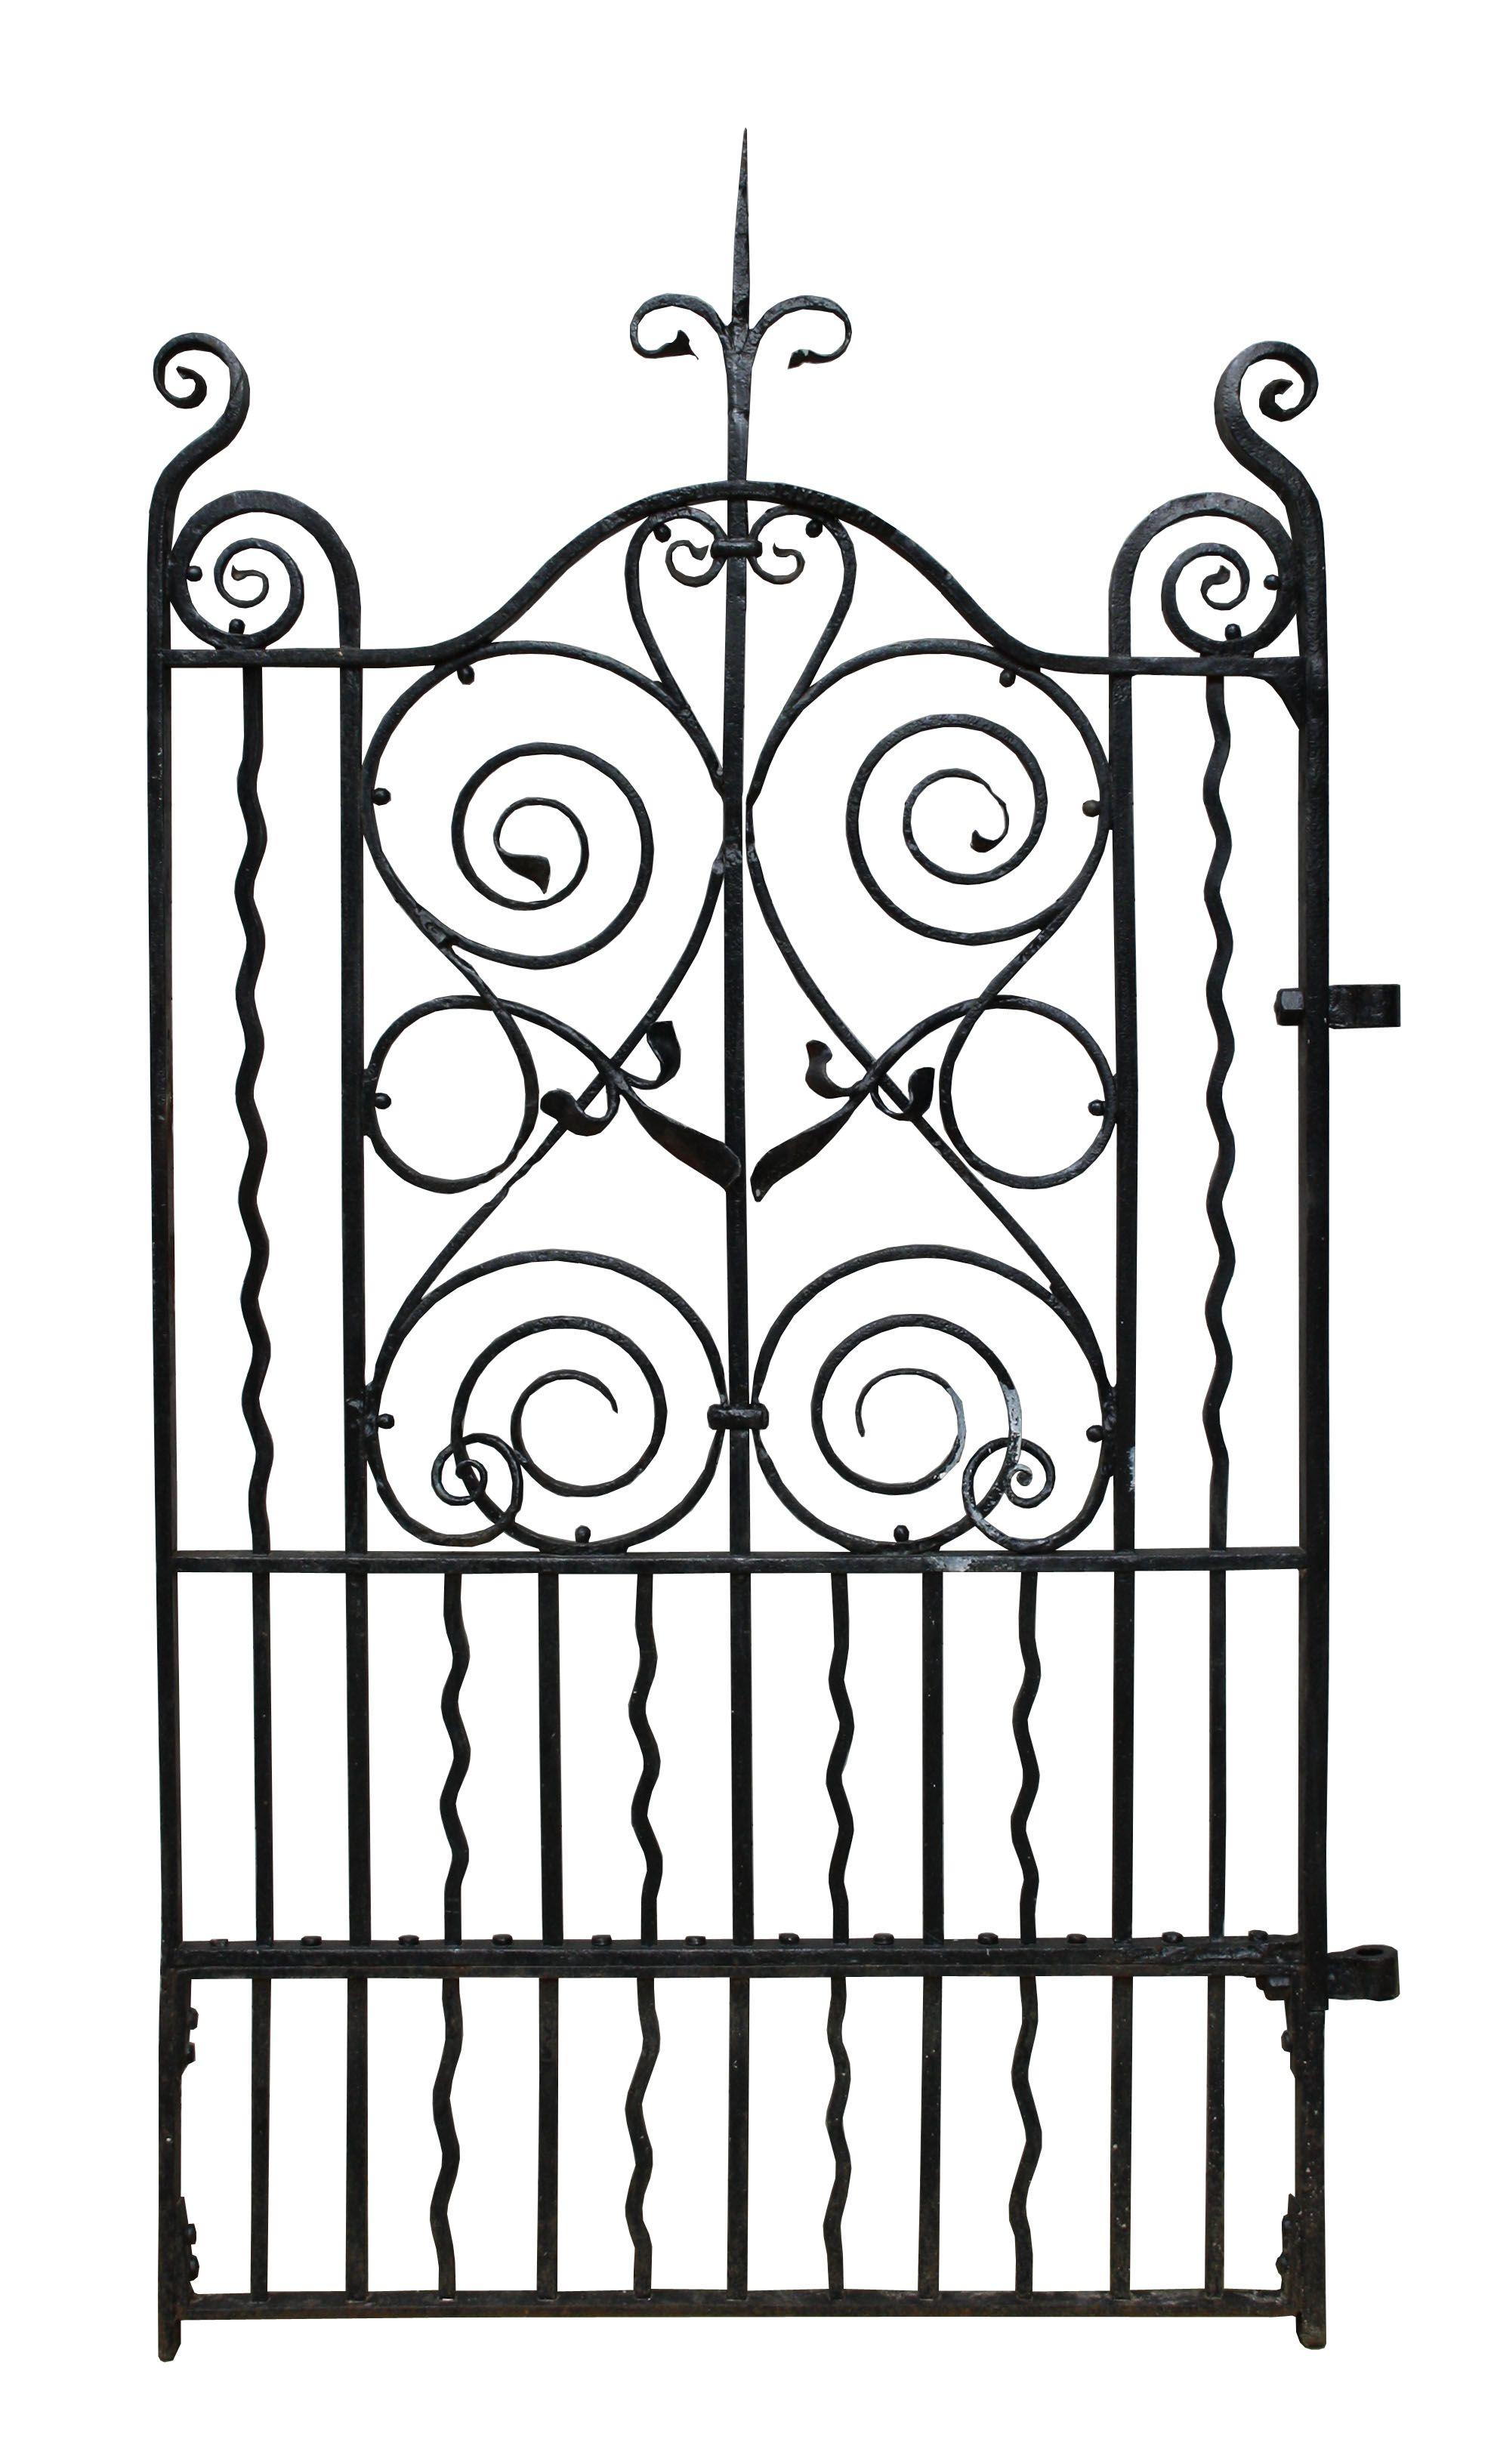 Victorian Wrought Iron Pedestrian Side Gate Uk Architectural Heritage Side Gates Vintage Garden Antique Bench